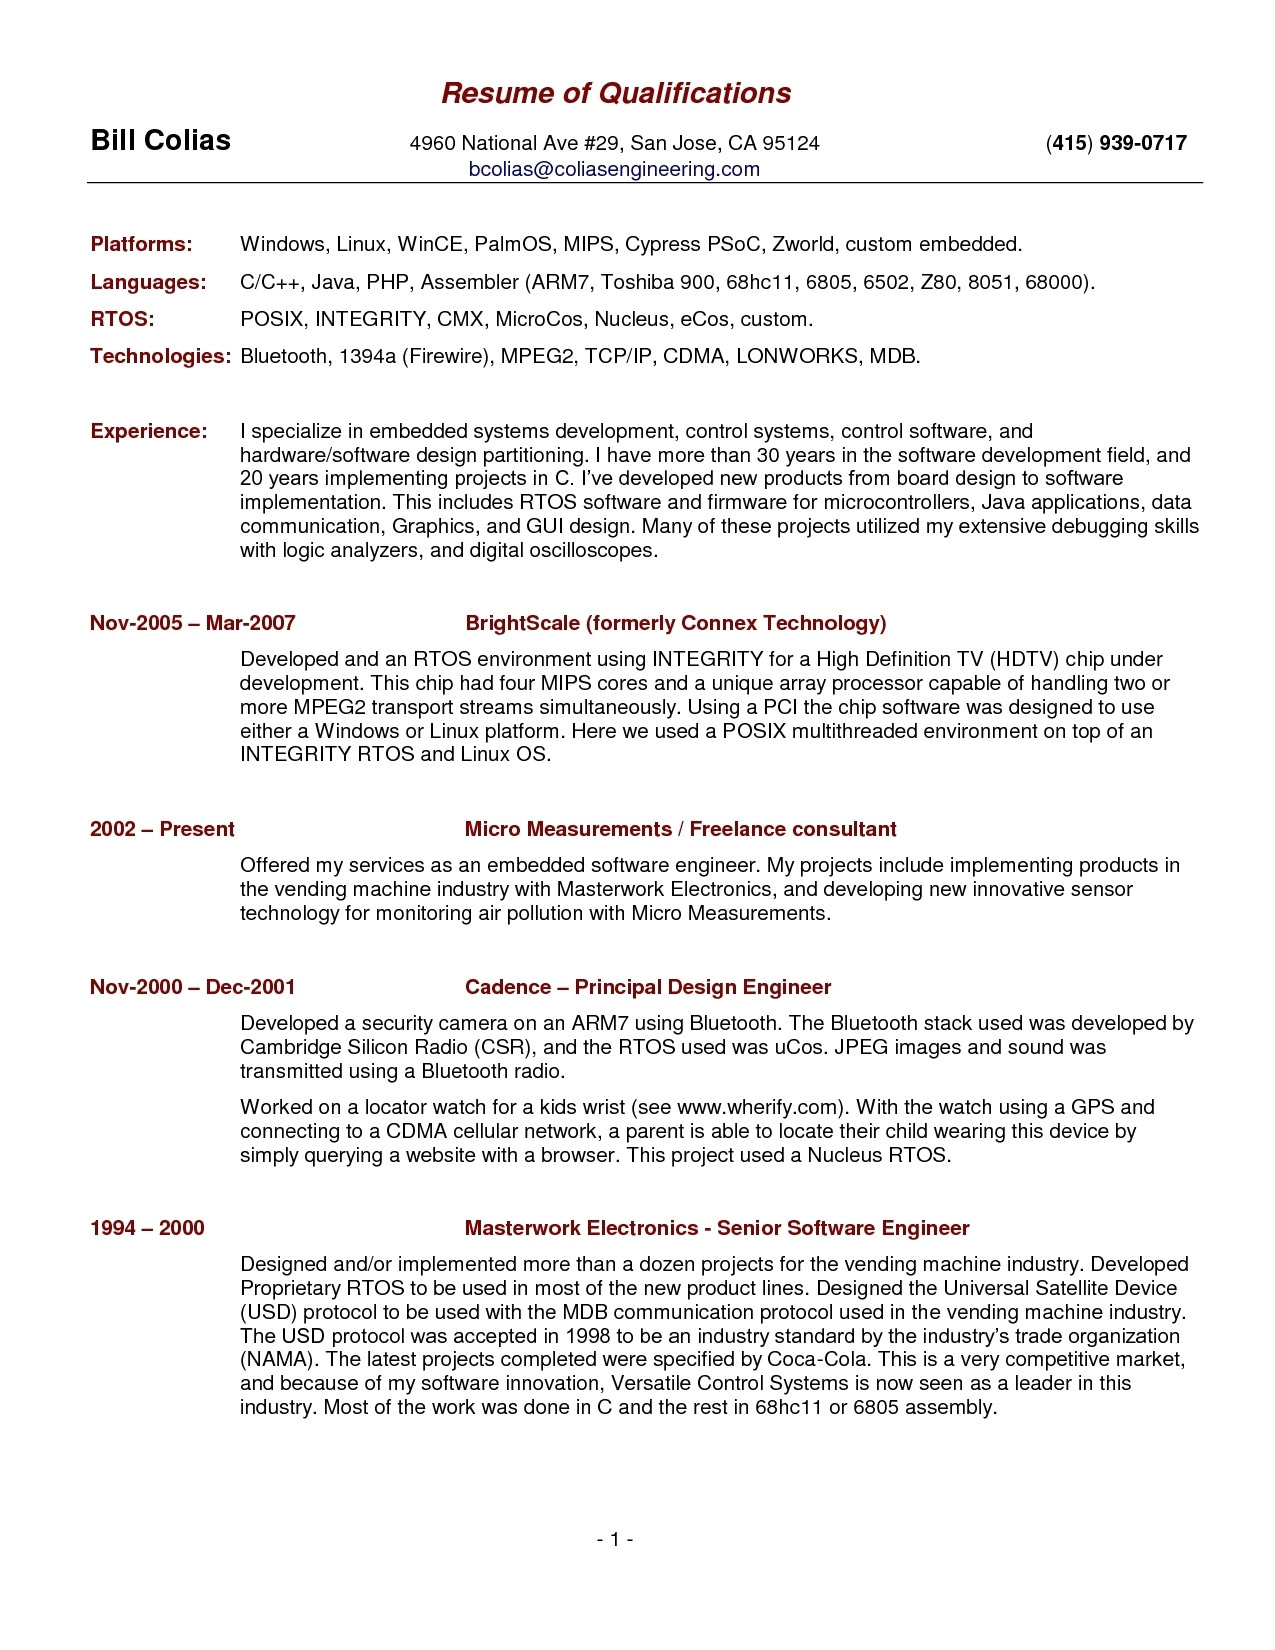 sample resume qualifications